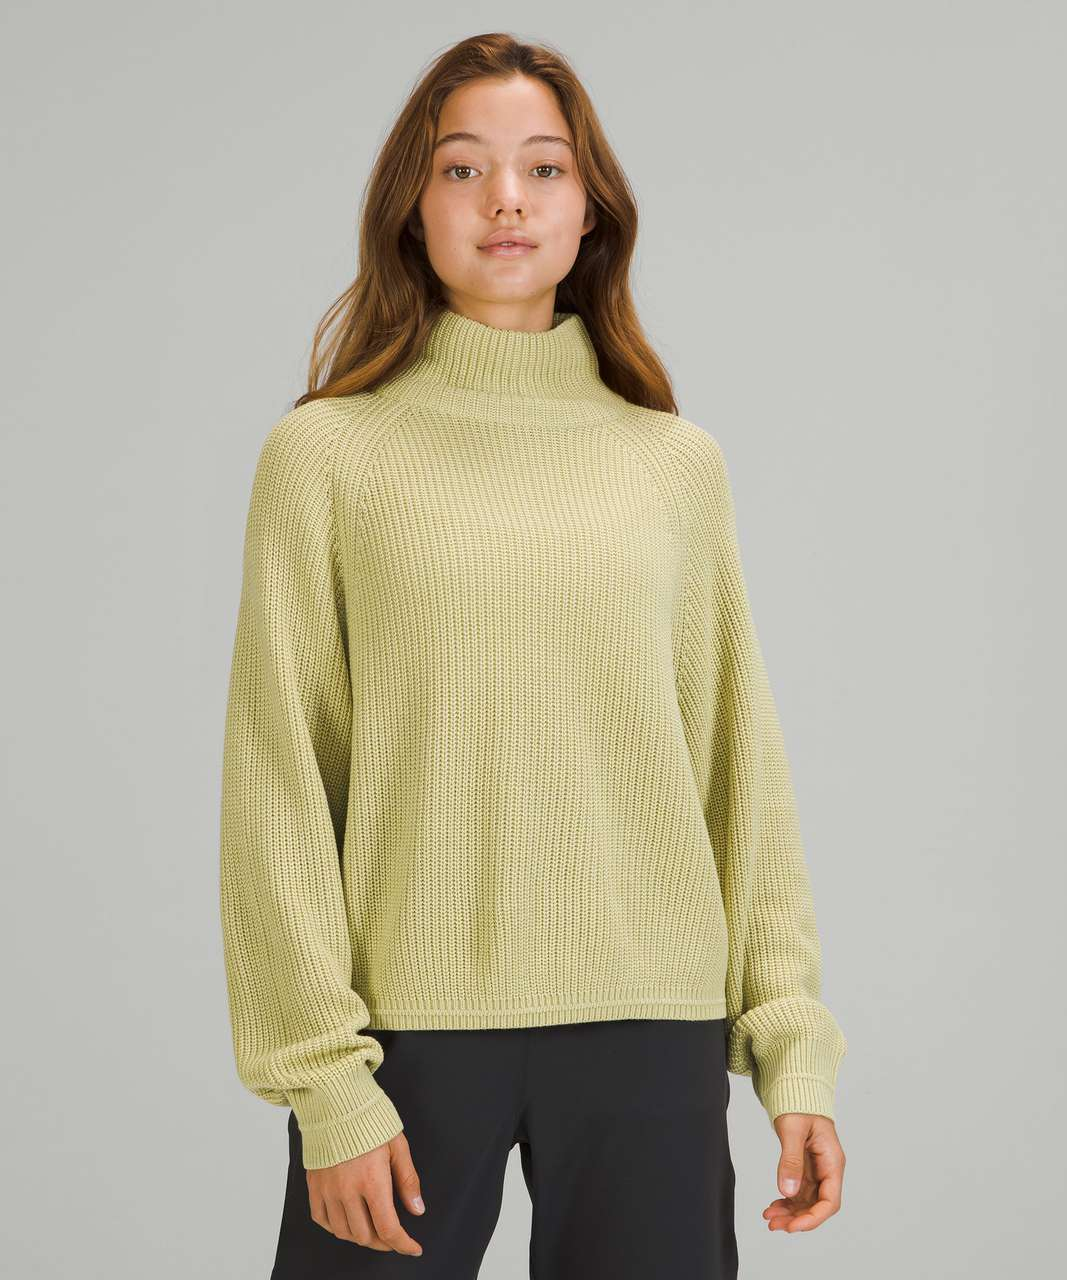 Lululemon Ribbed Turtleneck Sweater - Dew Green